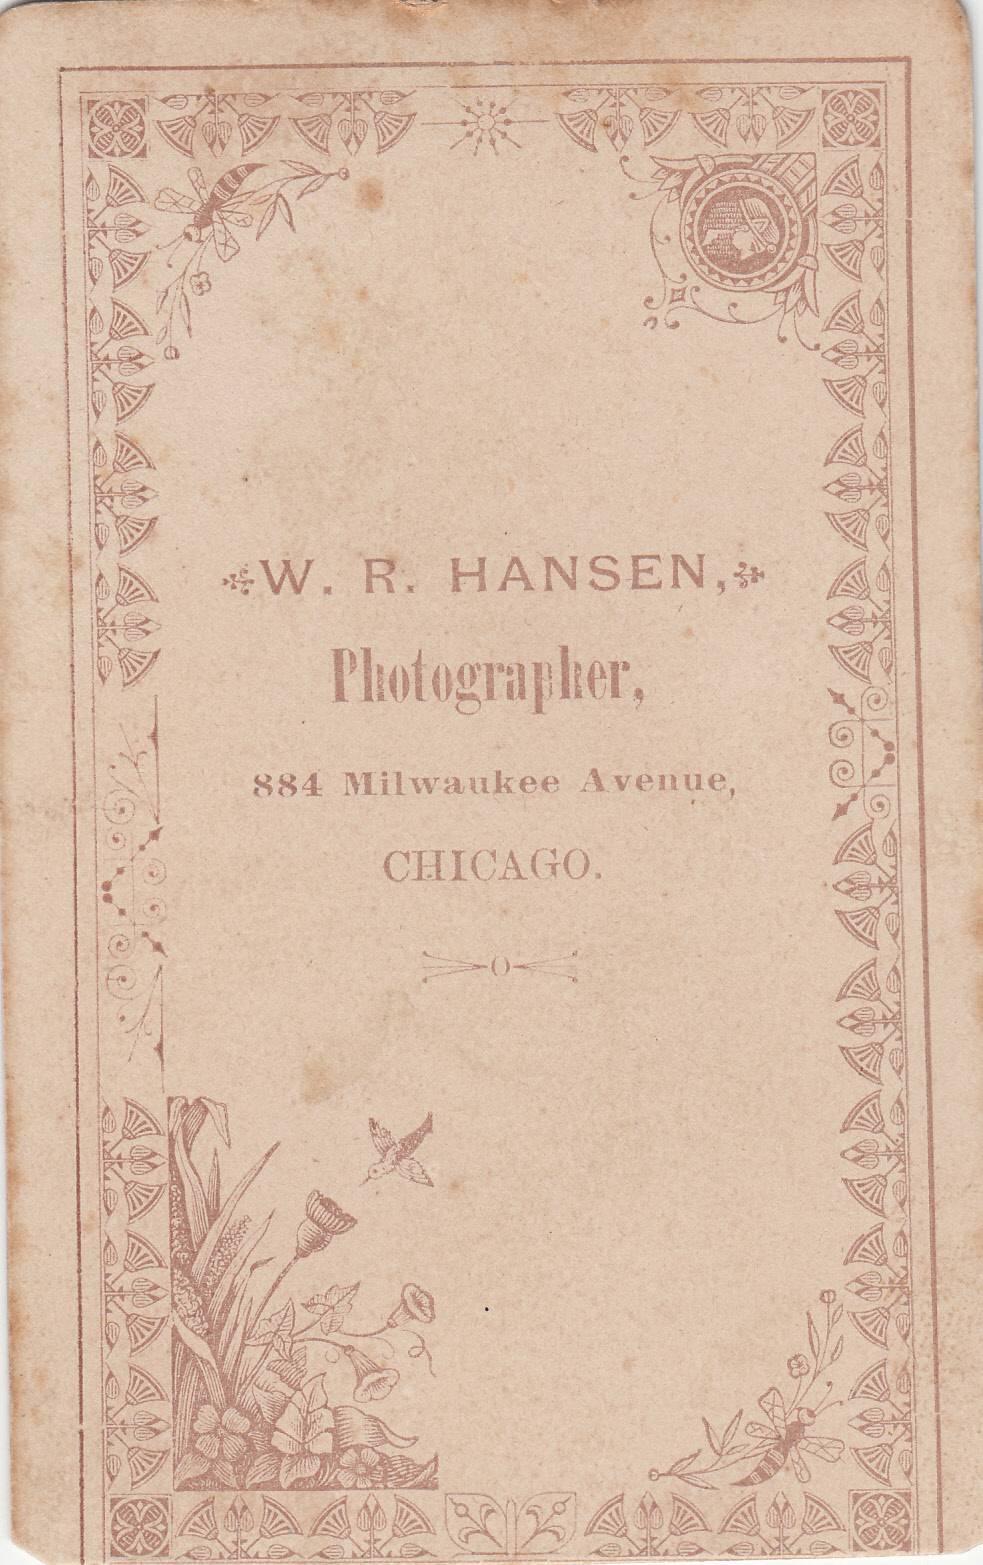 W. R. Hansen, photographer, of Chicago, IL - back